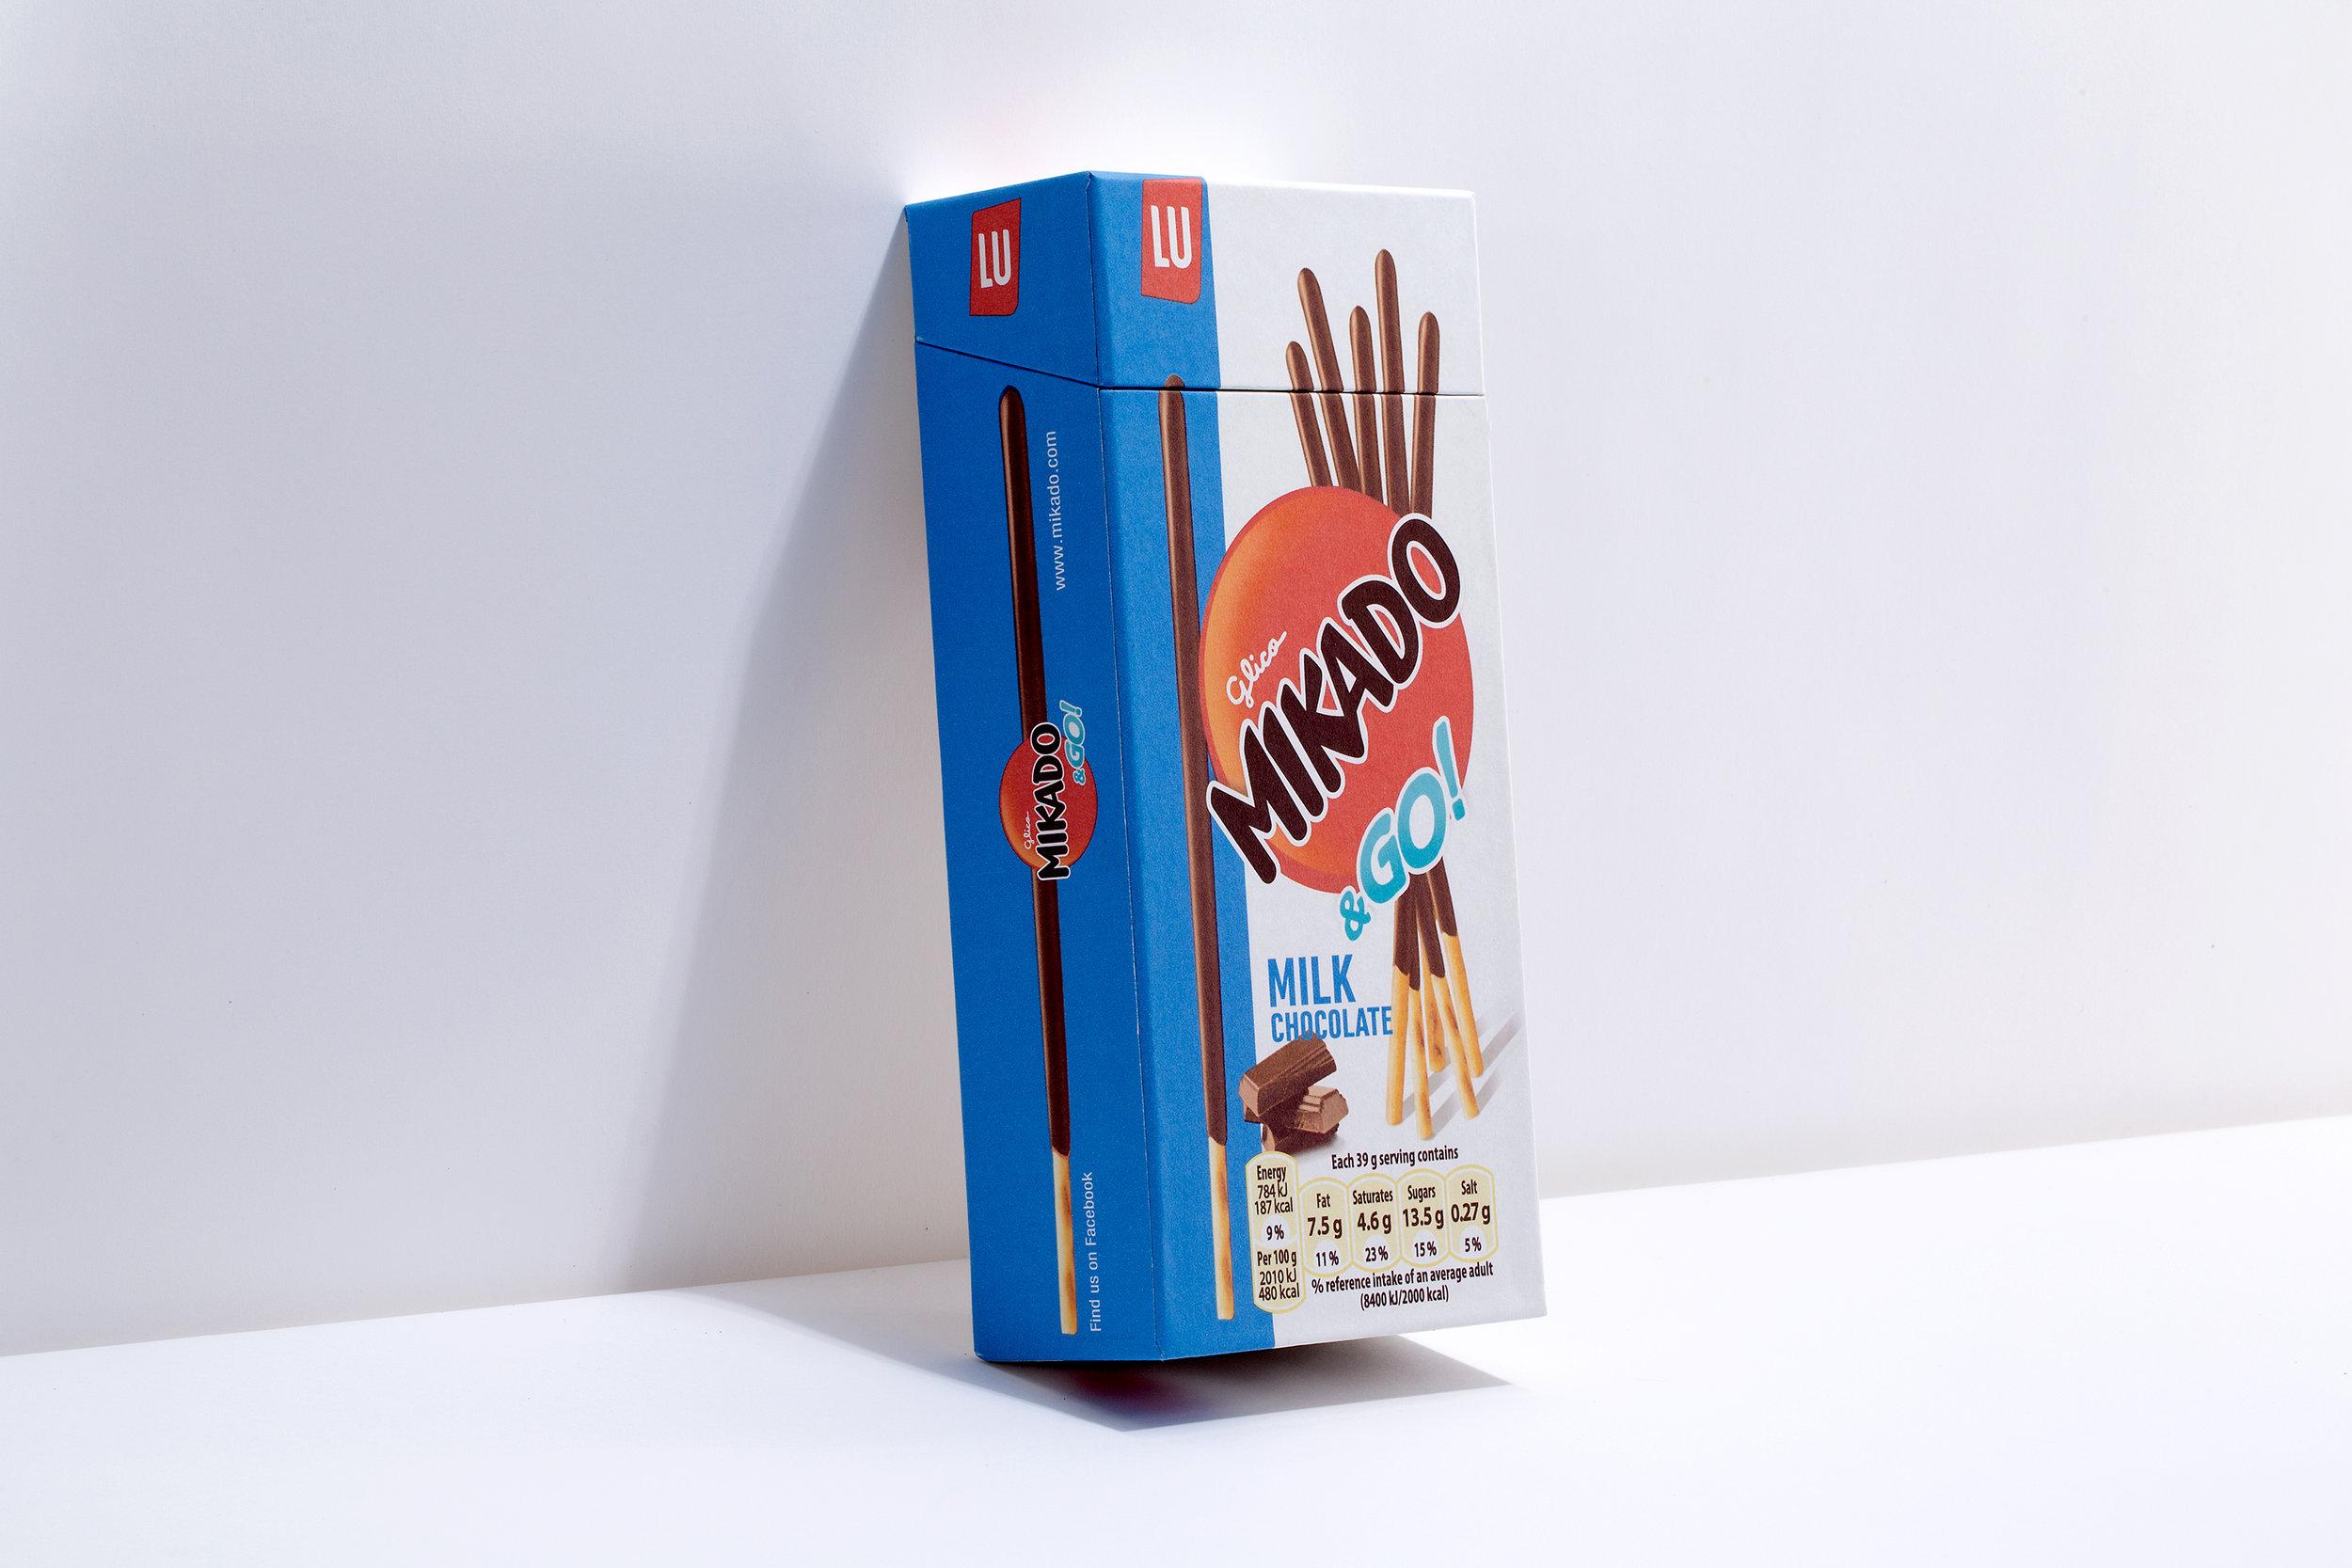 Giant_Mikado_box_1.jpg